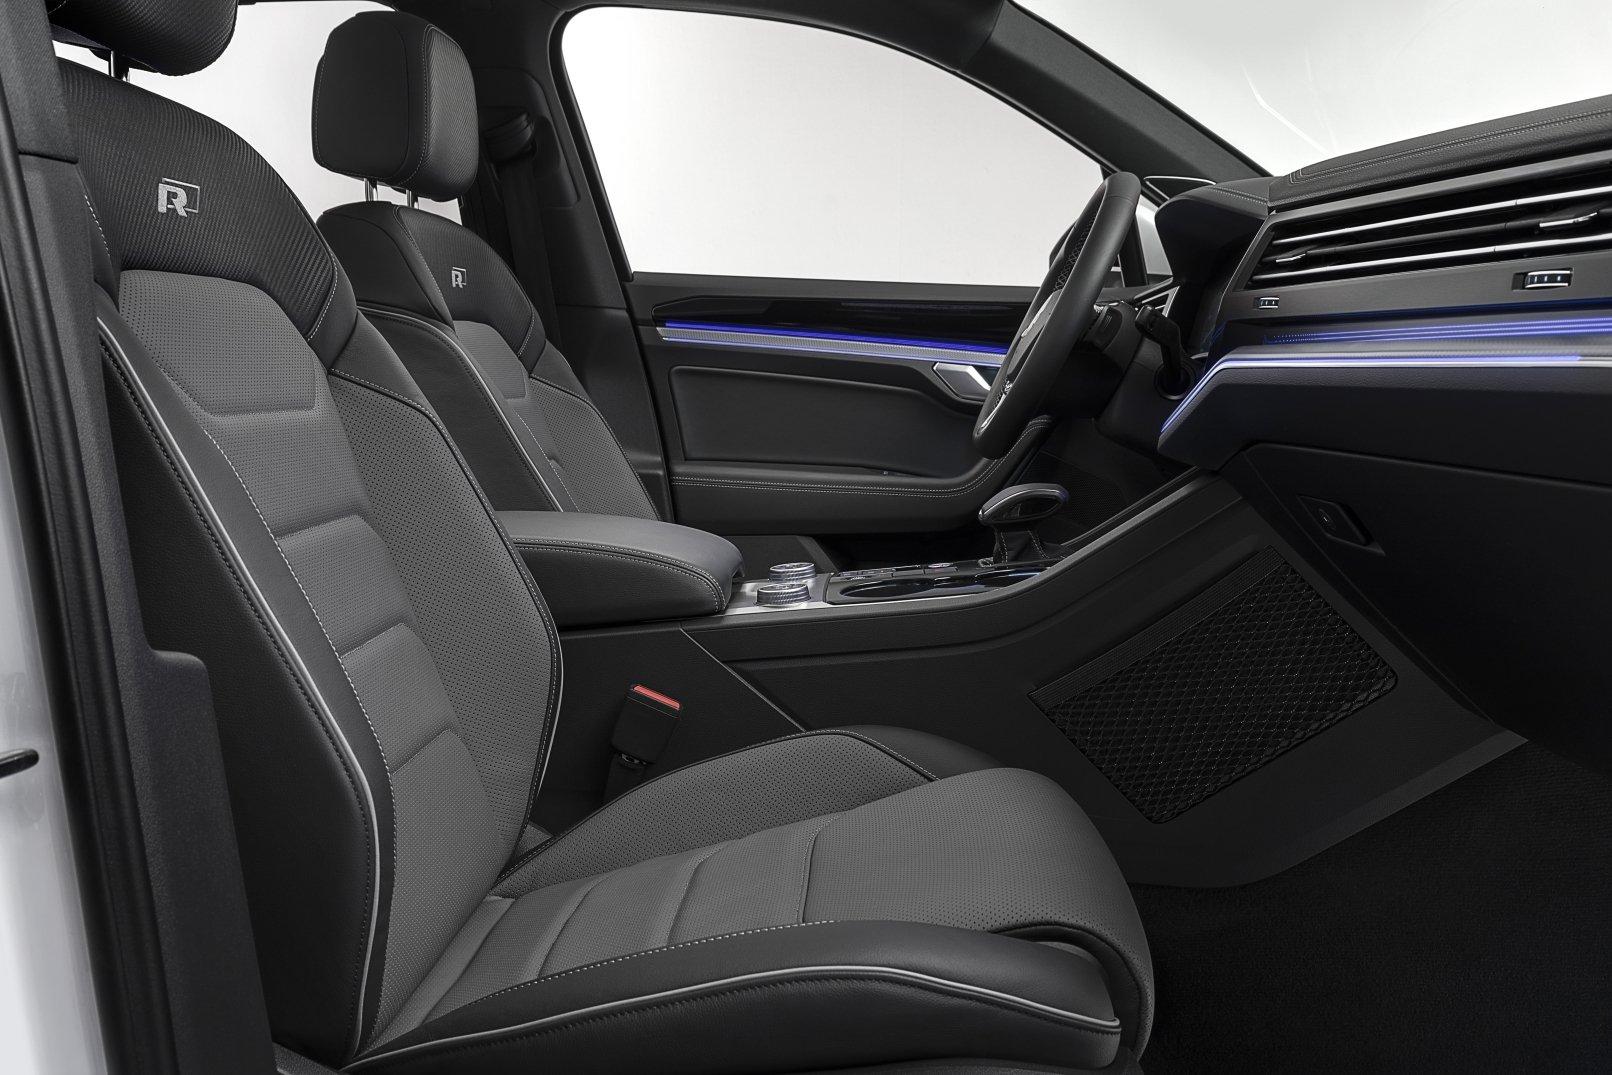 Volkswagen präsentiert den neuen Touareg - ALLES AUTO